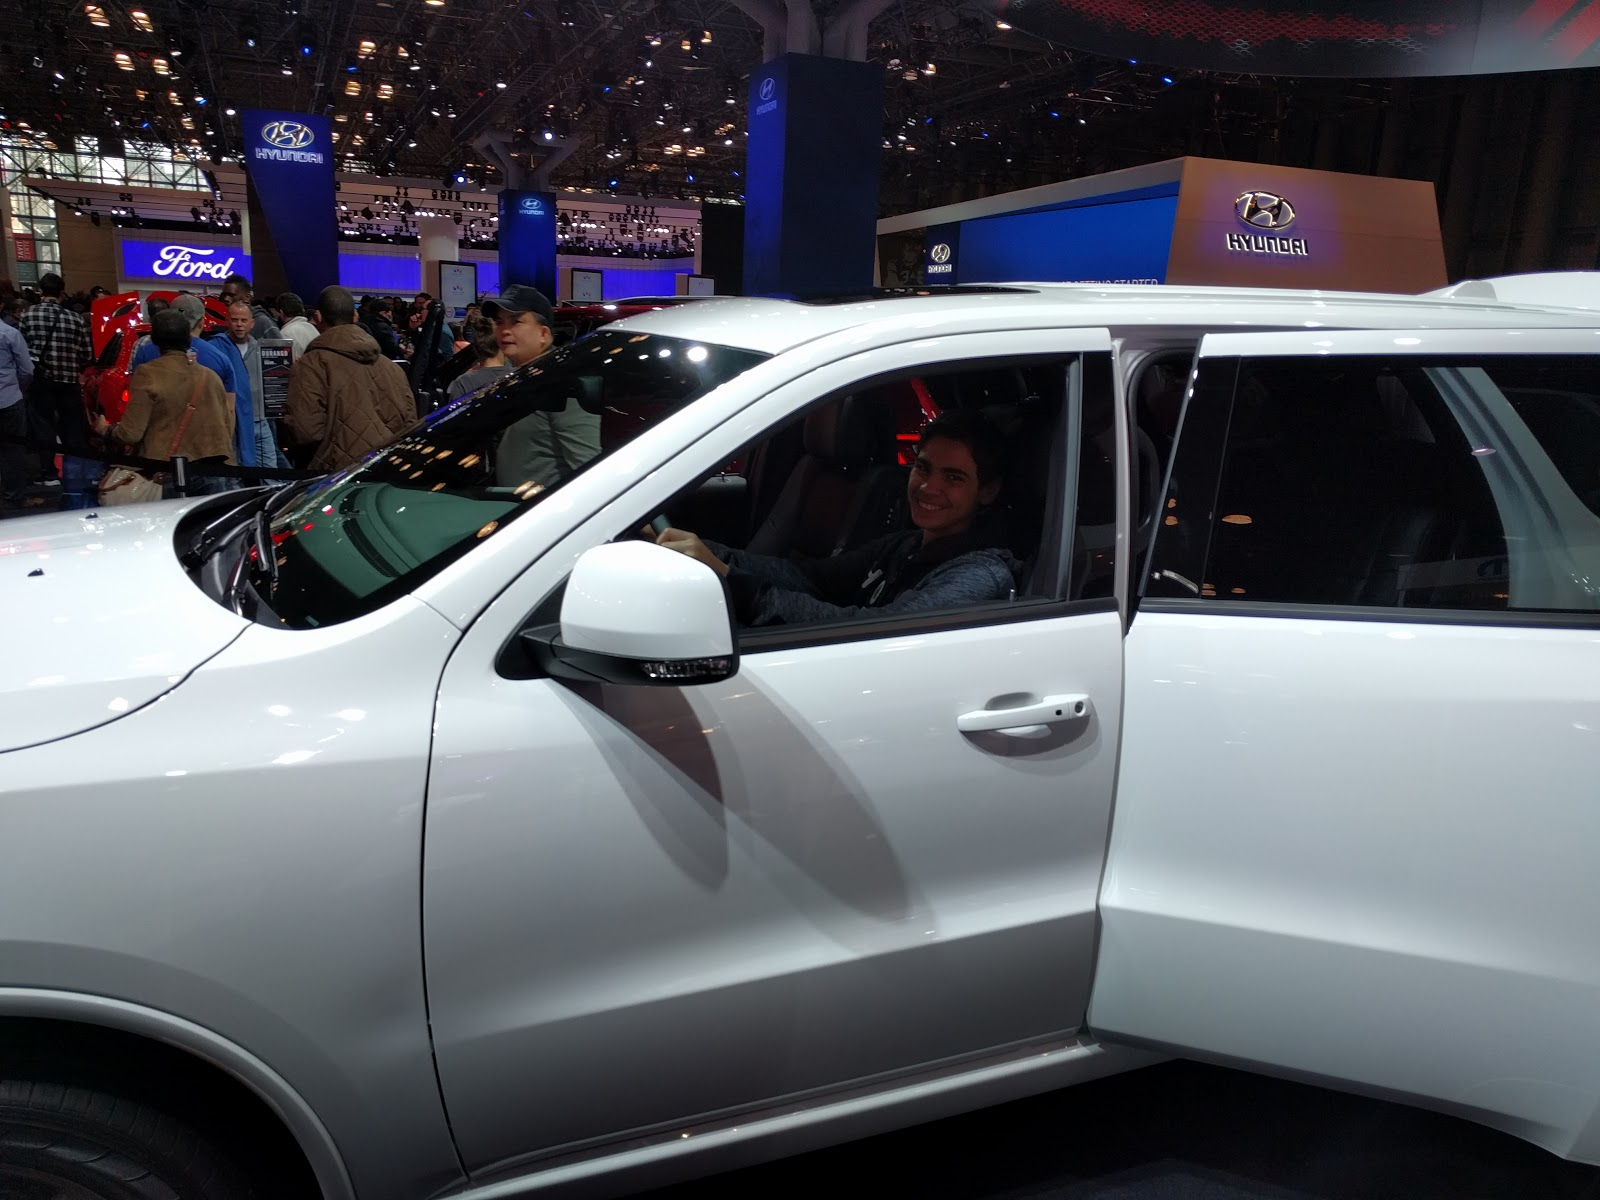 Dominick X Brana Javits Center Car Show - Car show javits center